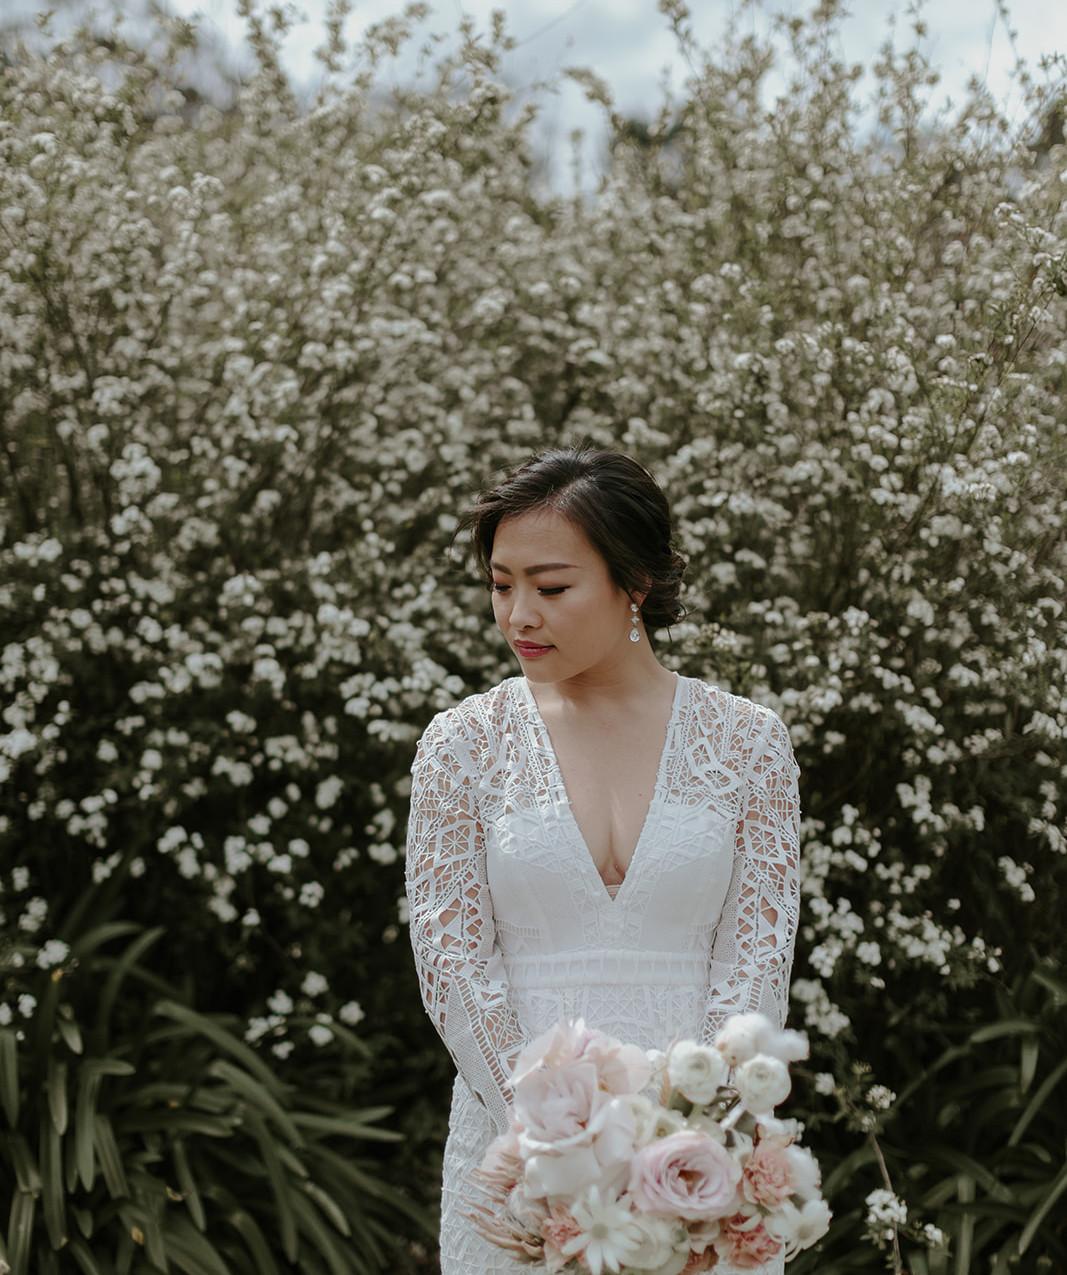 Wedding Photography Sydney  Photography: Zoe Morley Photography